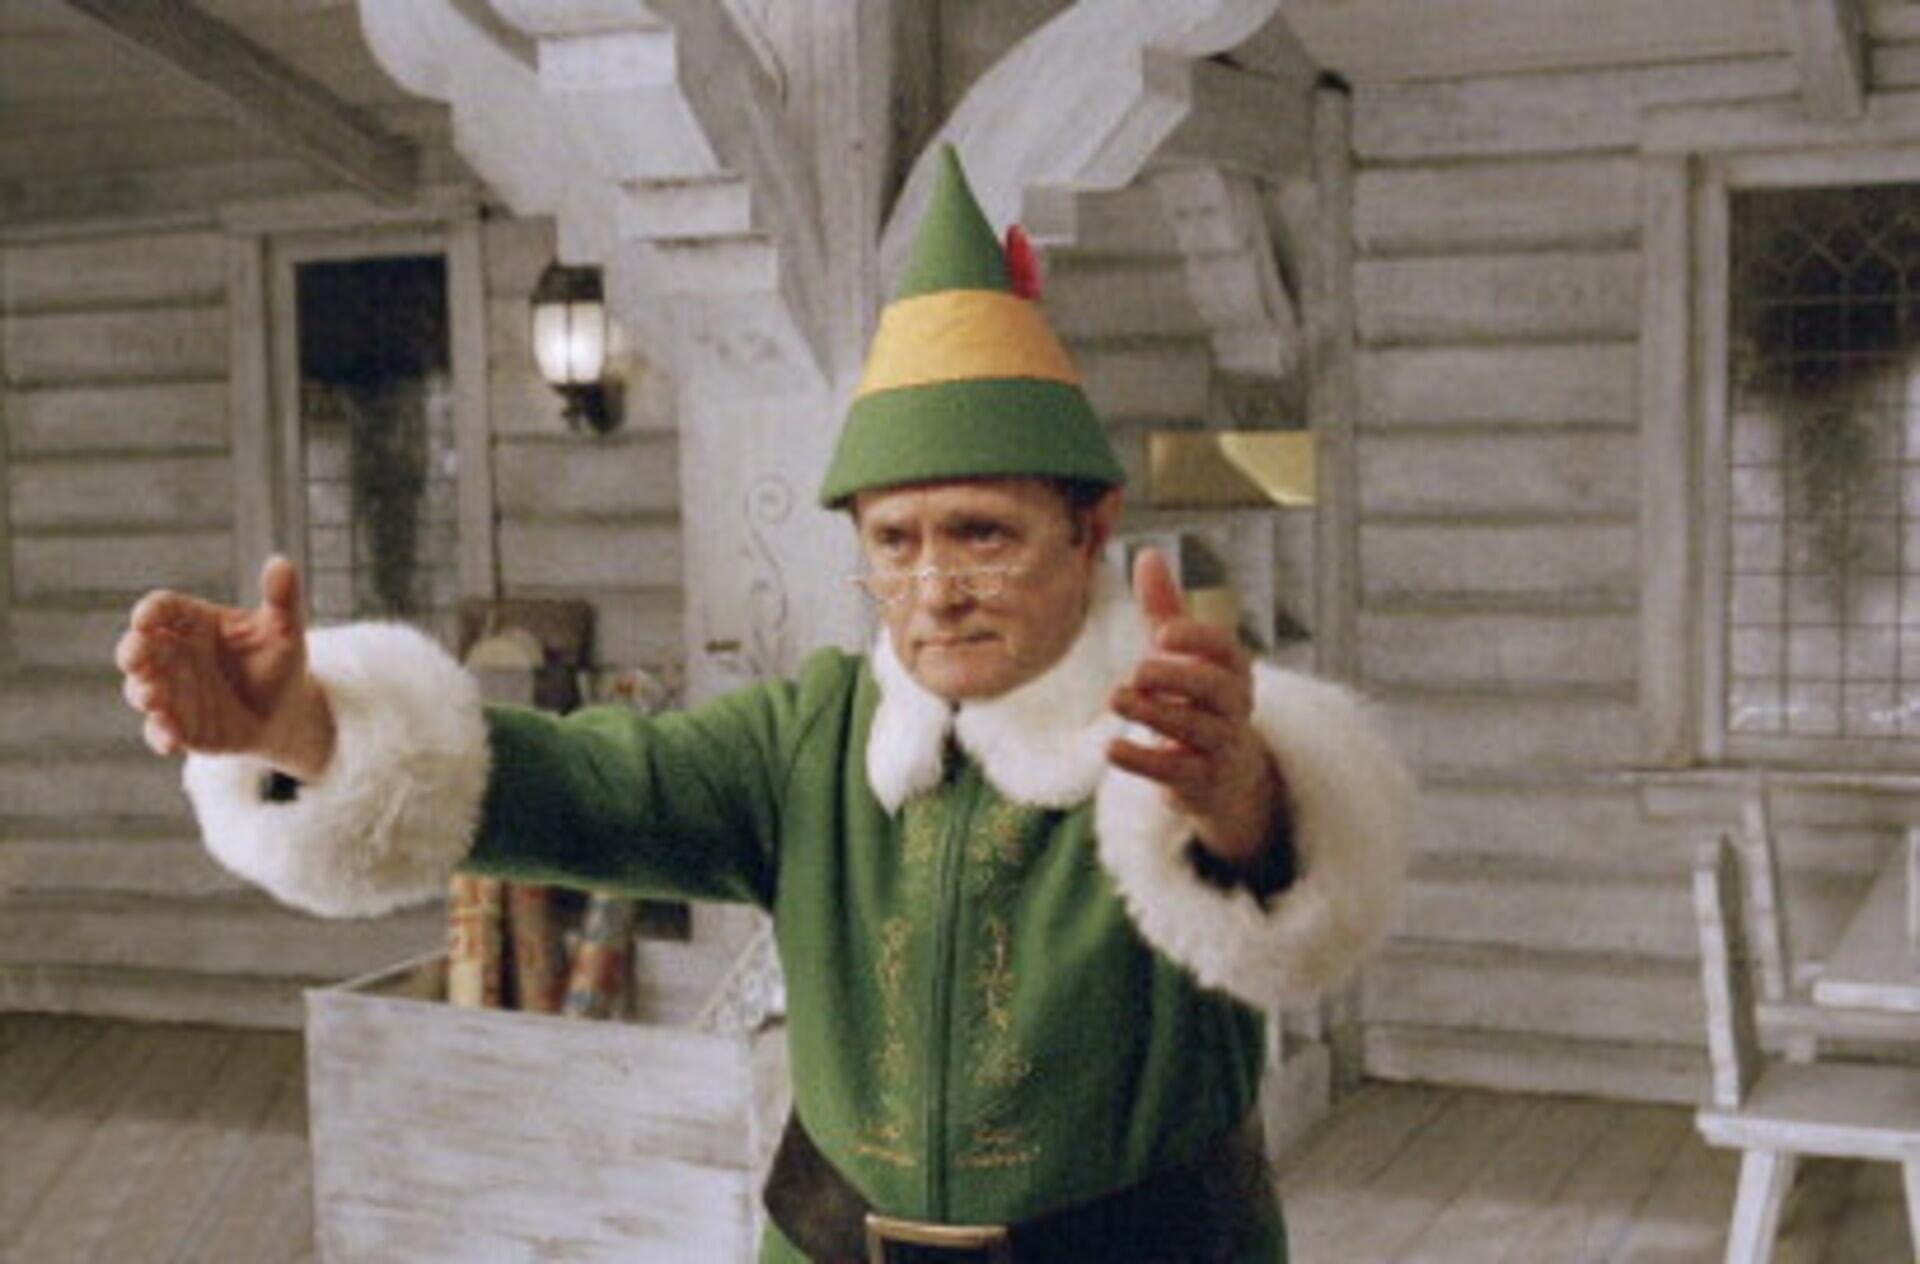 Elf - Image 9